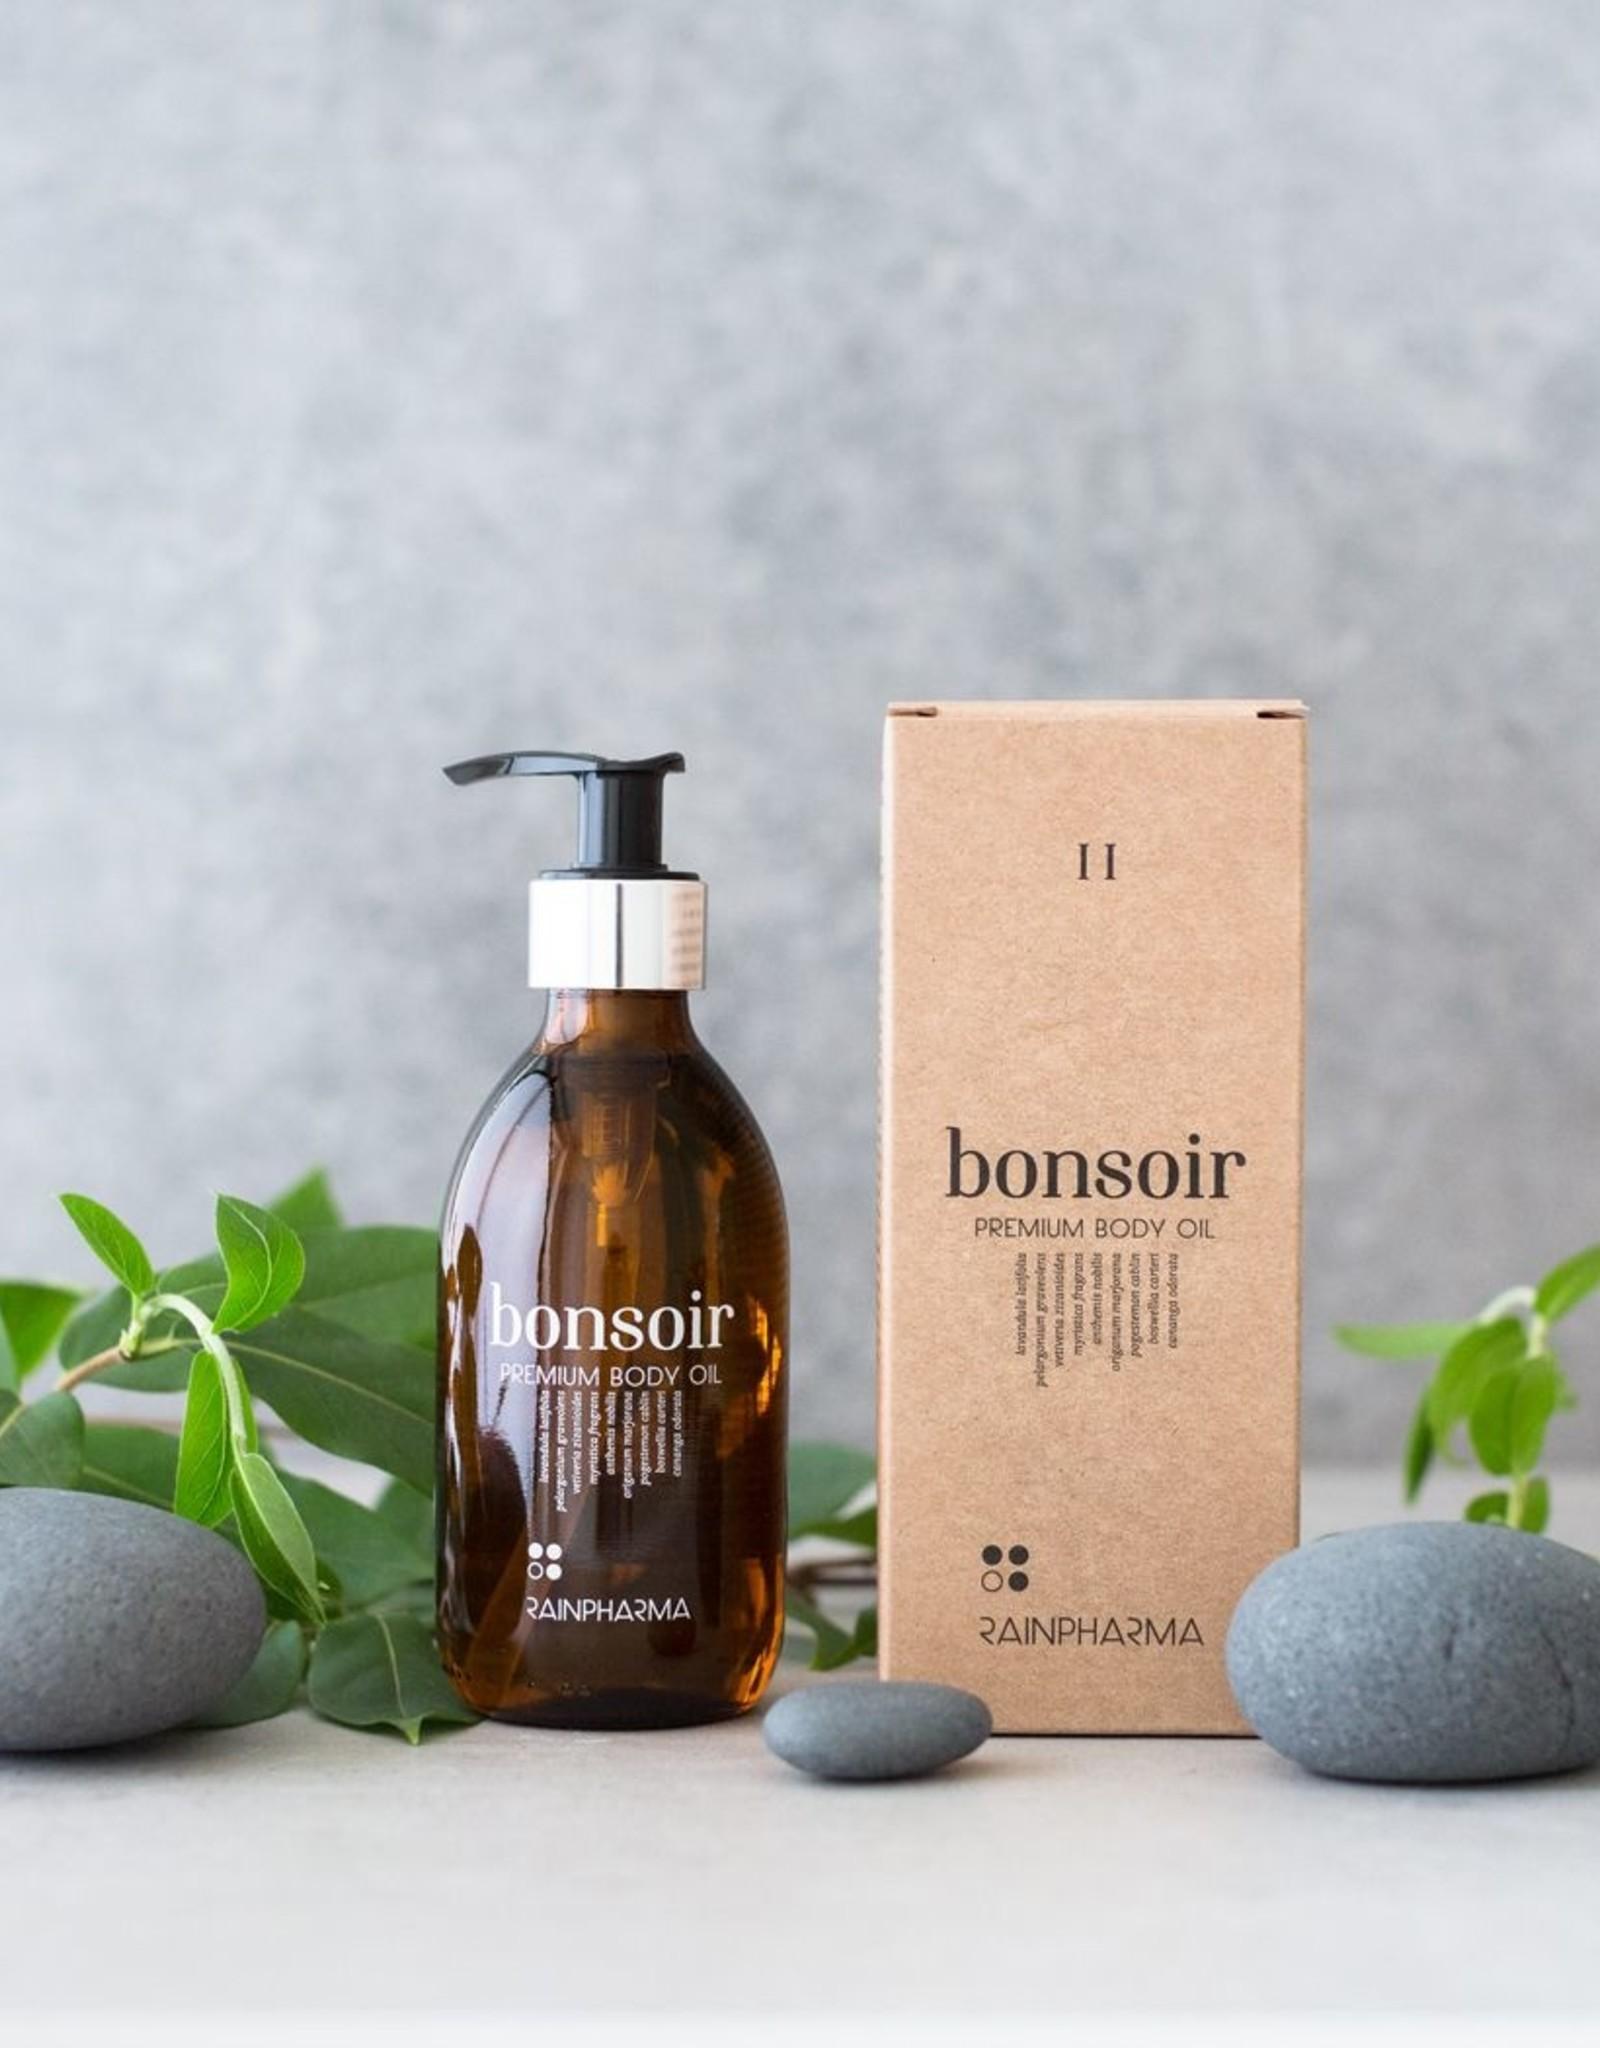 RainPharma Bonsoir Premium Body Oil 250ml - Rainpharma